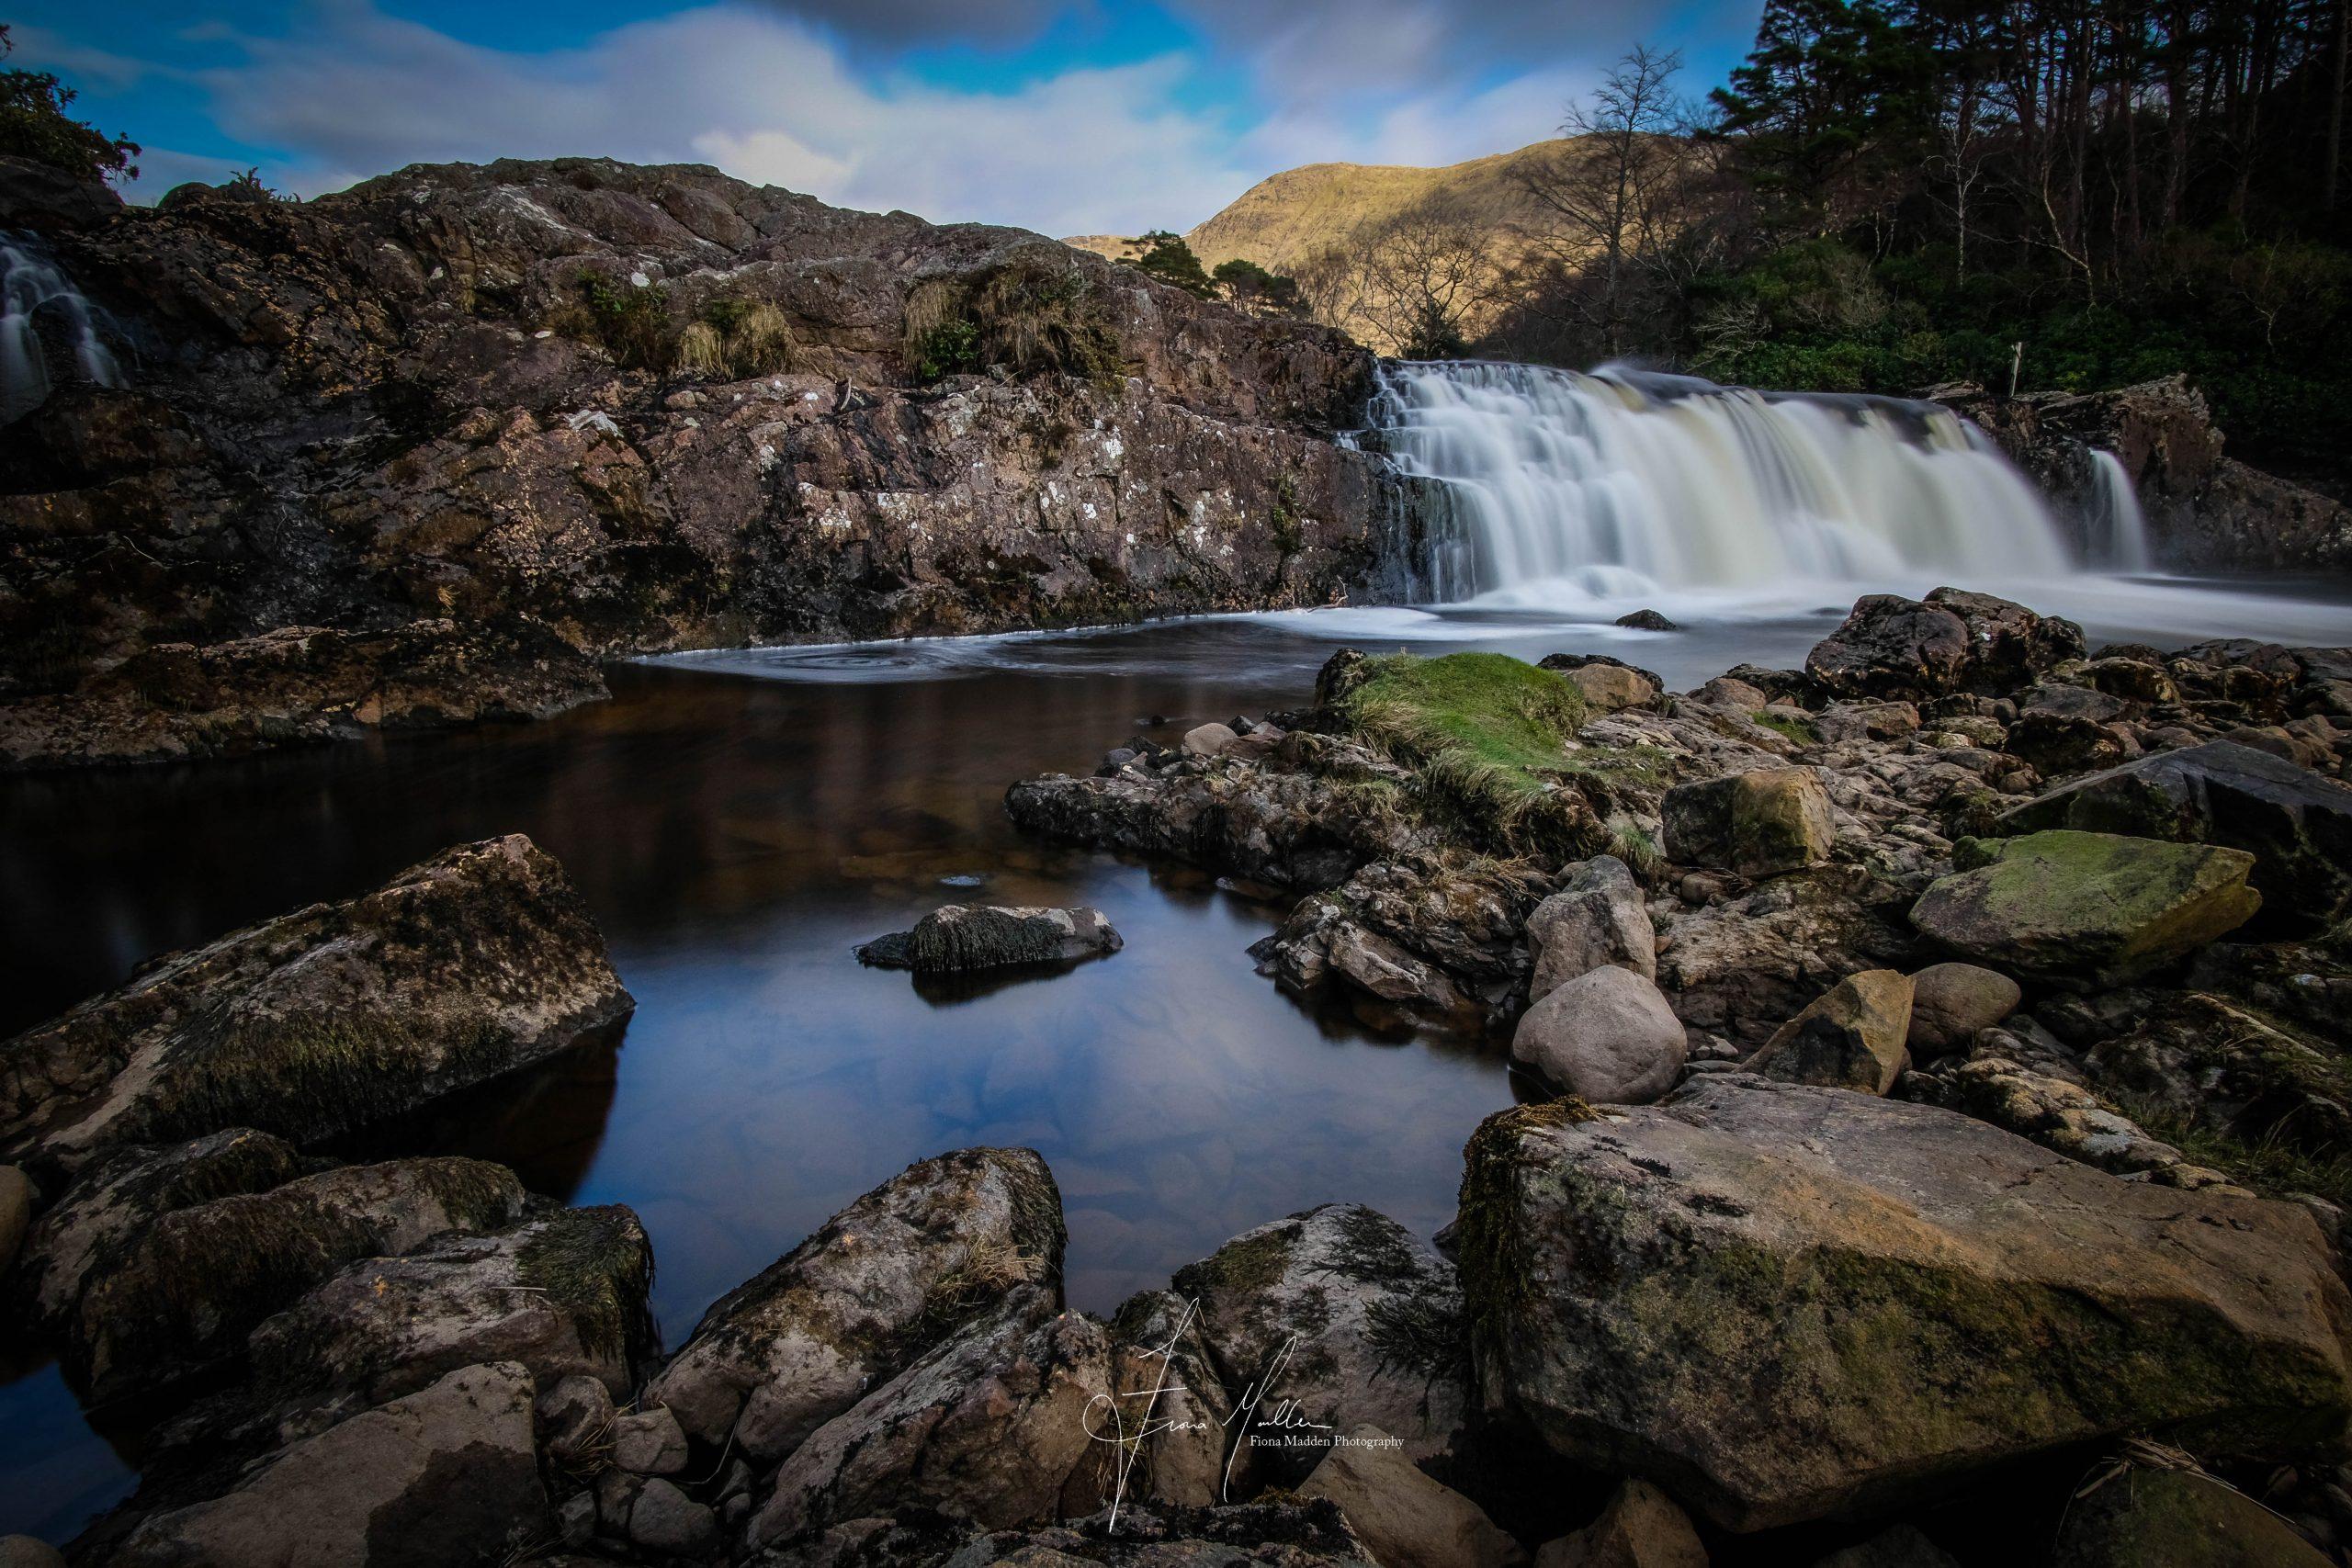 waterfall-ireland-fiona-madden-photography